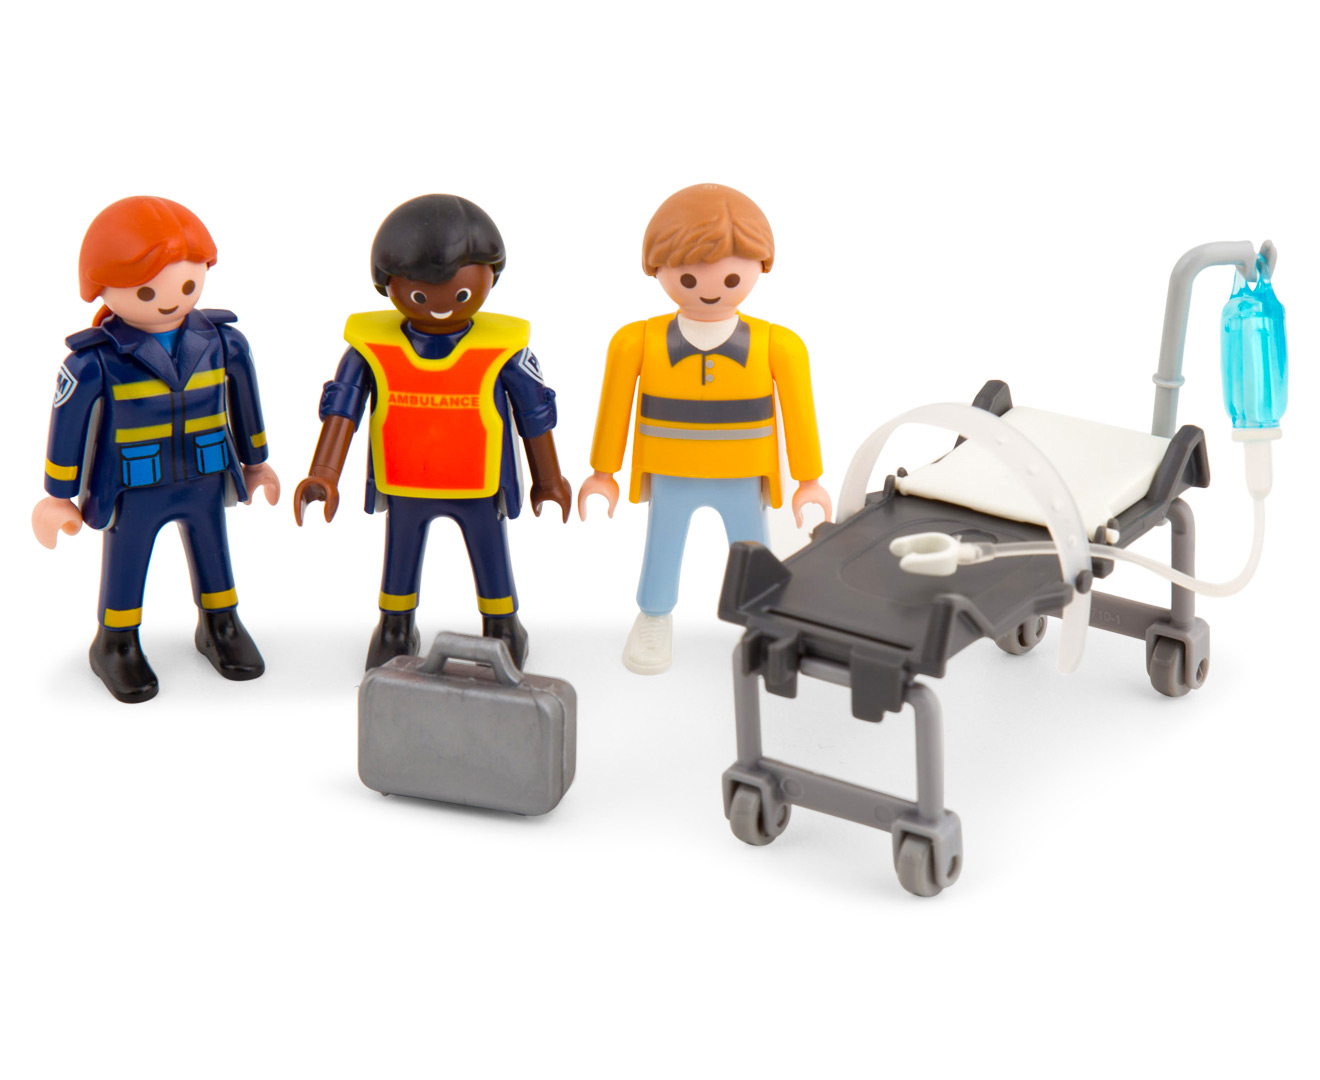 Playmobil Rescue Ambulance w Light & Sound Building Set | Great ...